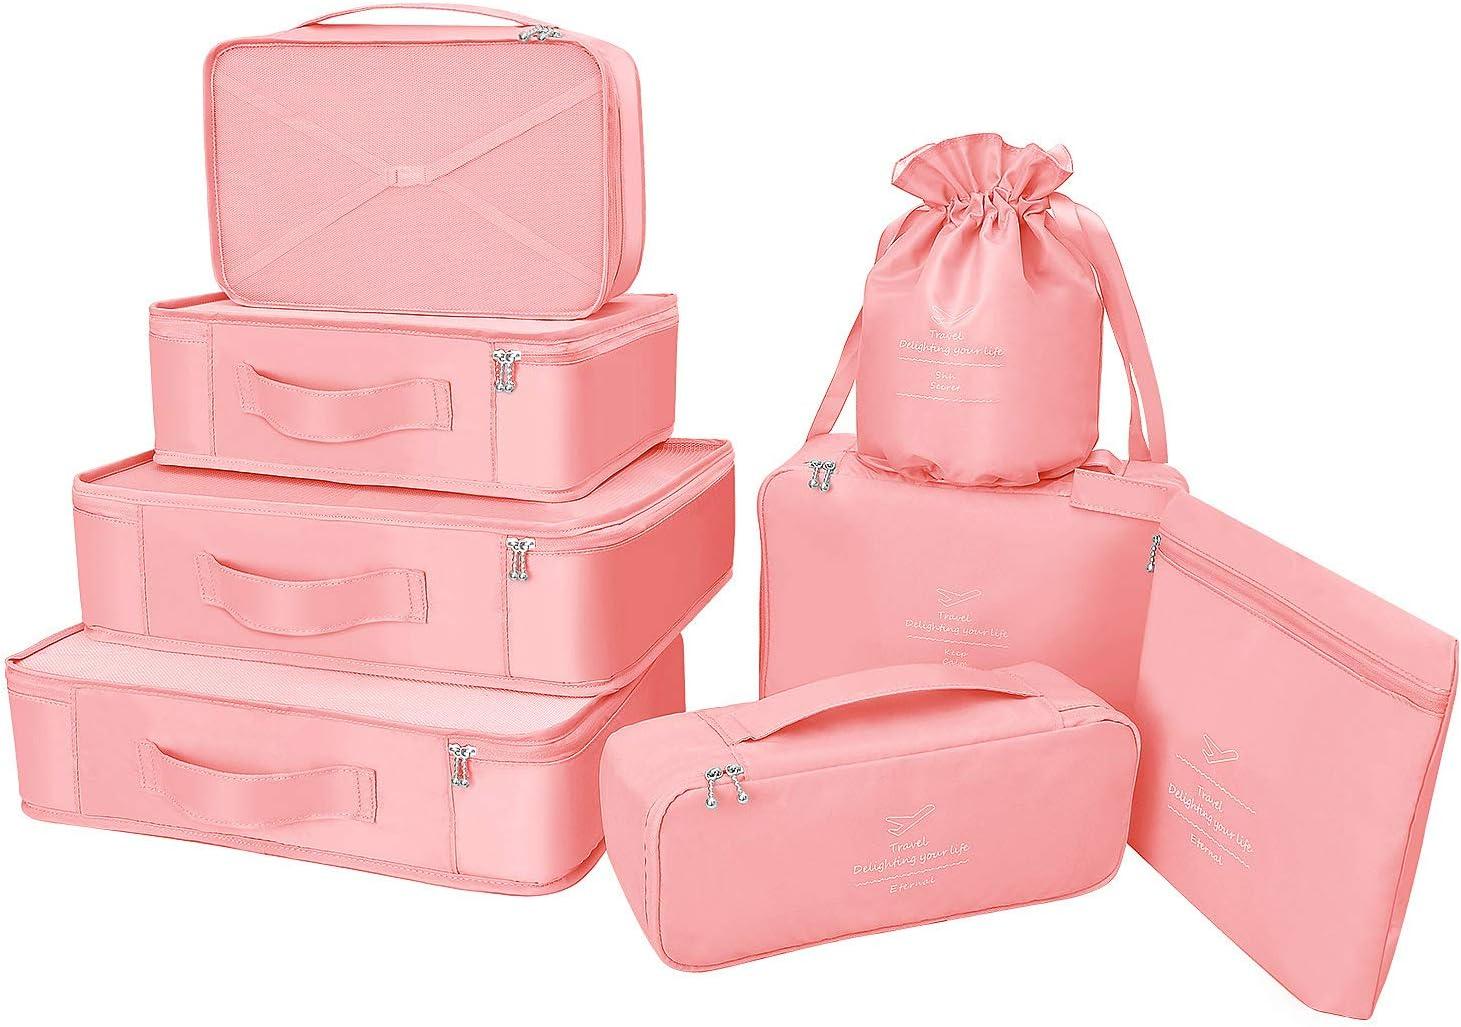 Organizador para Maletas Packing Cubes 8 Juegos/7 Colores ¨²ltimo Dise?o Incluyen Bolsa de Almacenamiento de Zapatos Impermeable Conveniente Bolsas de Compresi¨®n para el Viajero